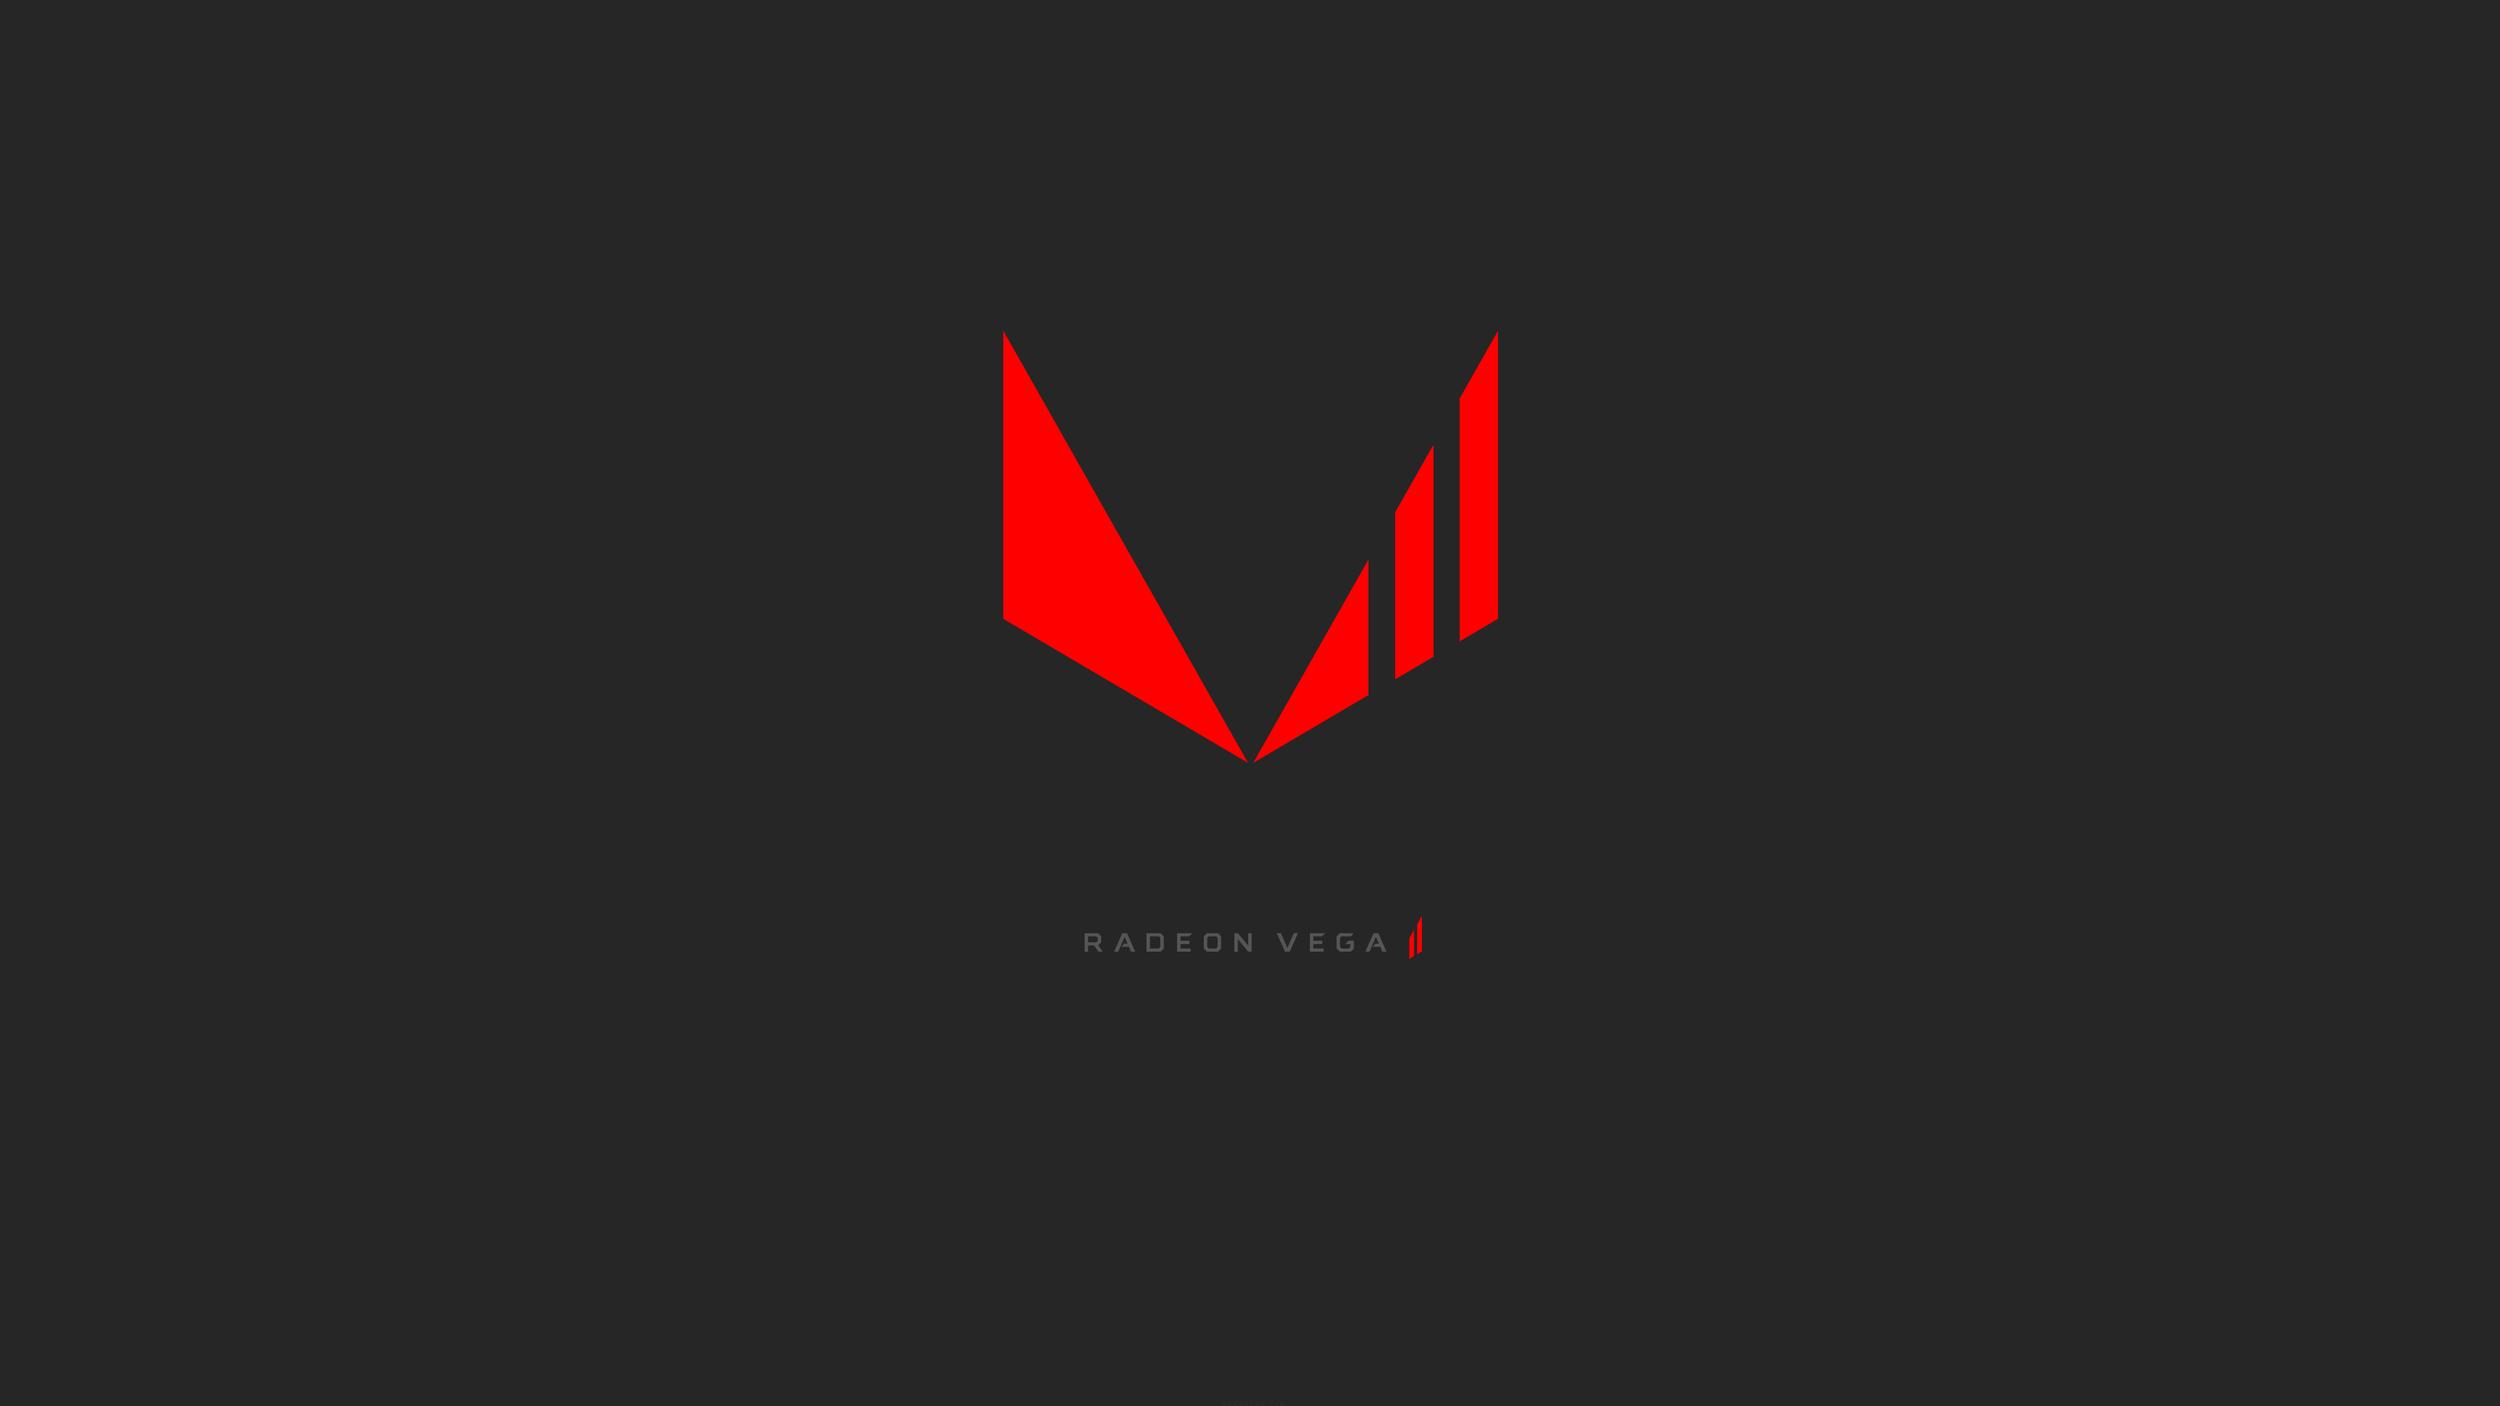 AMD+radeon+vega+2+II+Wallpaper